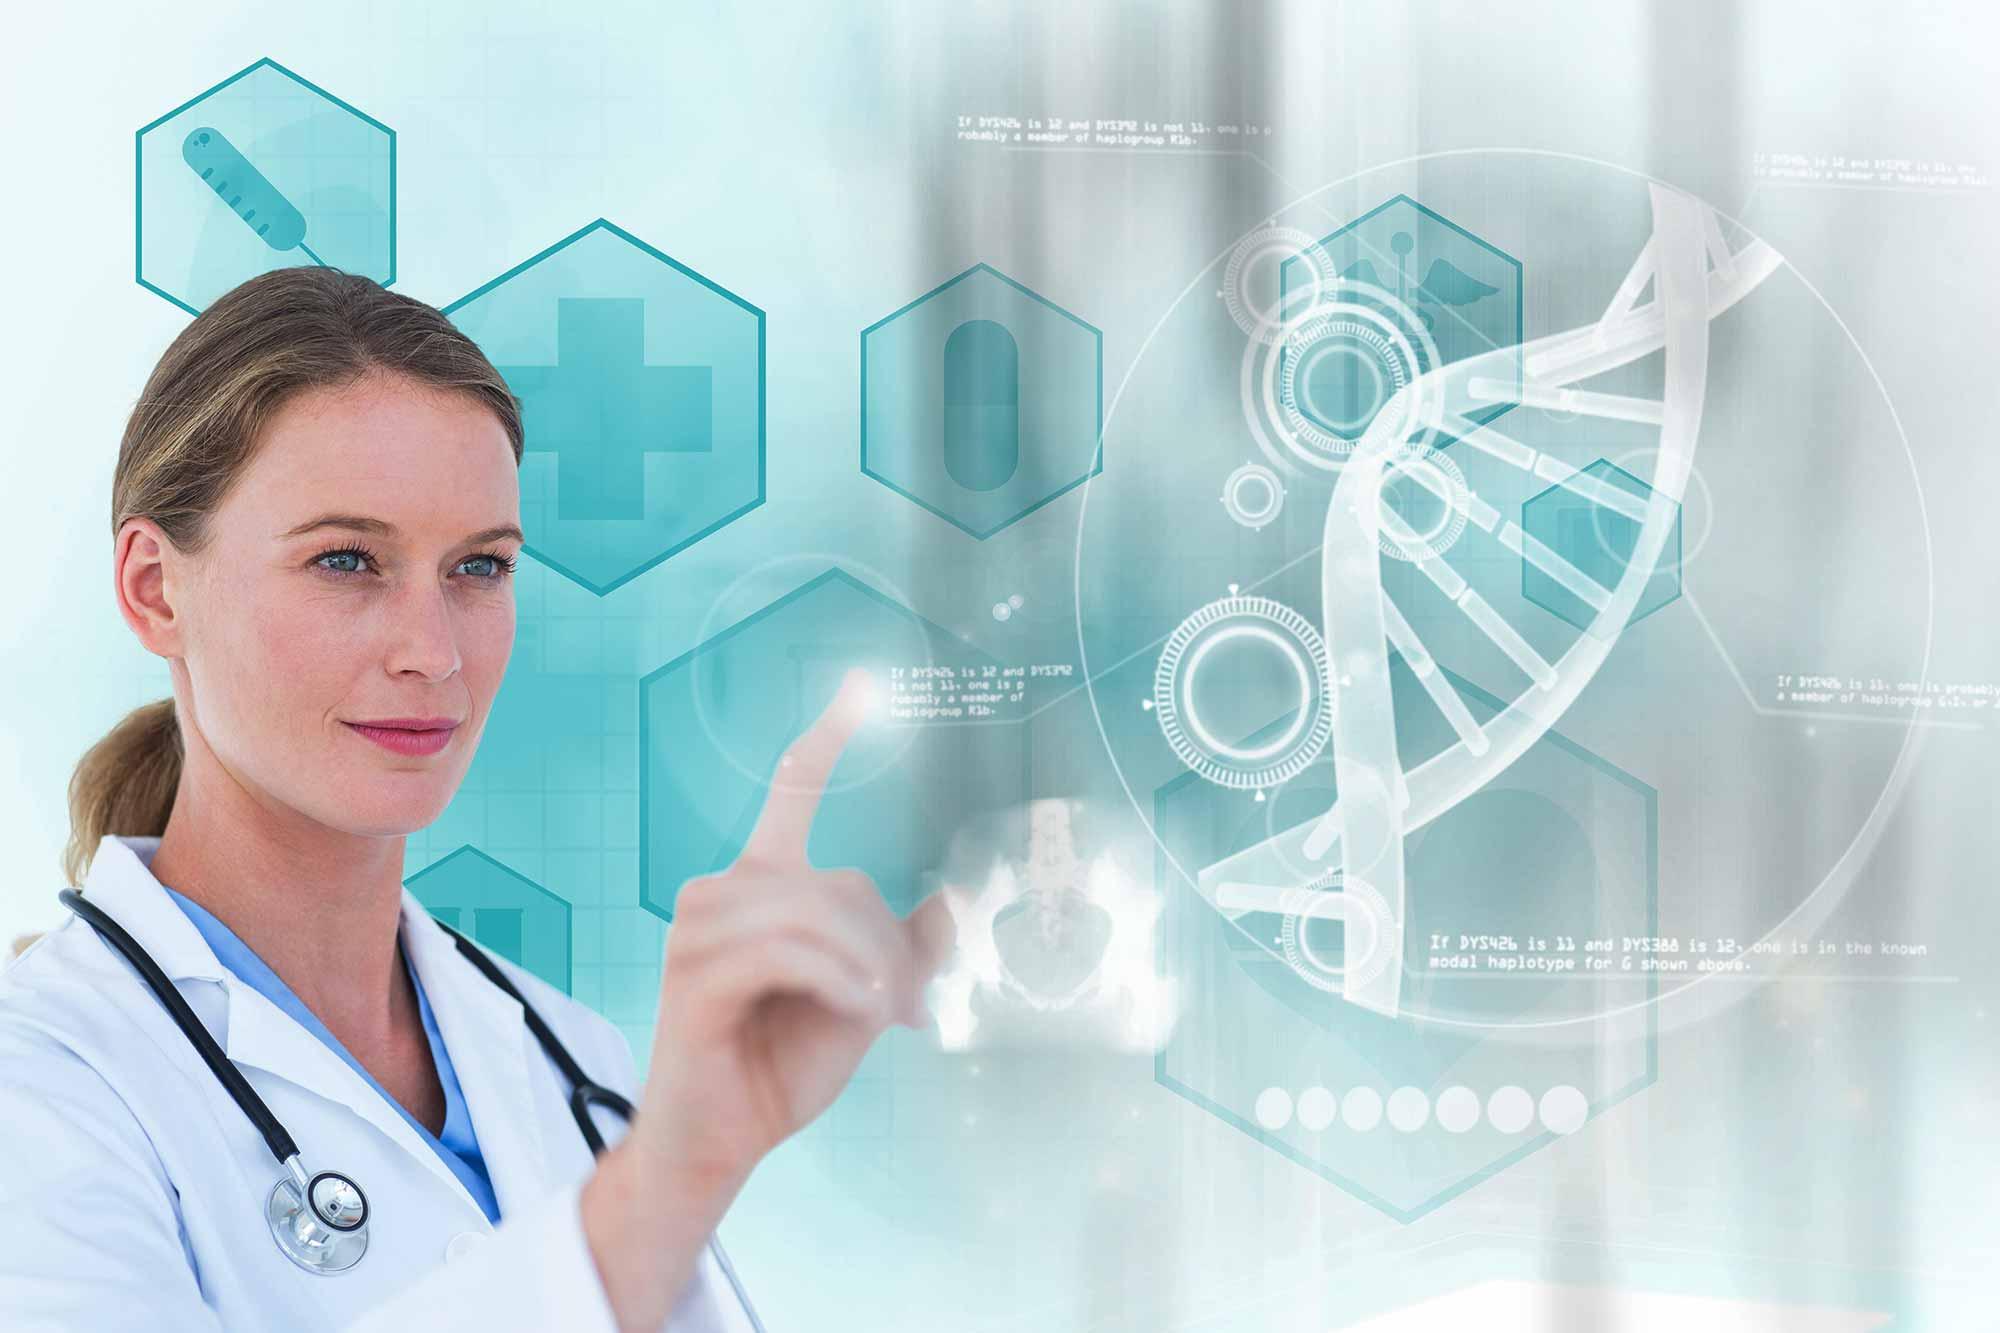 Smarte medizinische Dinge – Implantate und Geräte